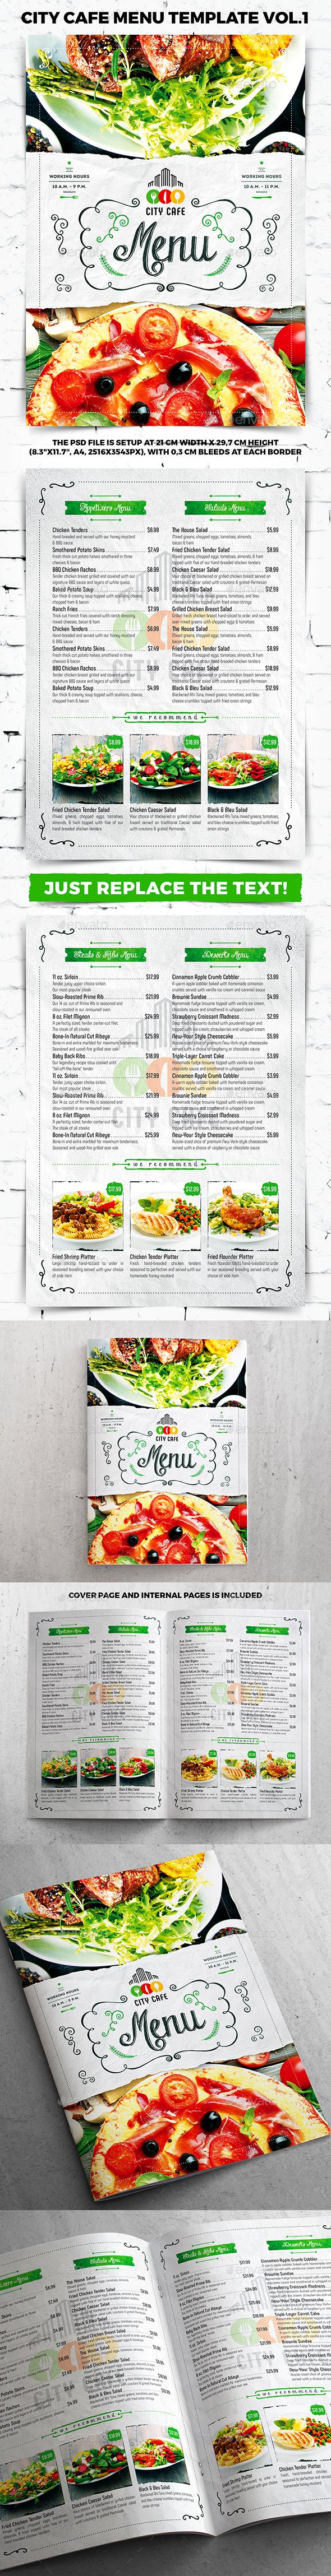 City Cafe Menu Template vol.1 - Food Menus Print Templates